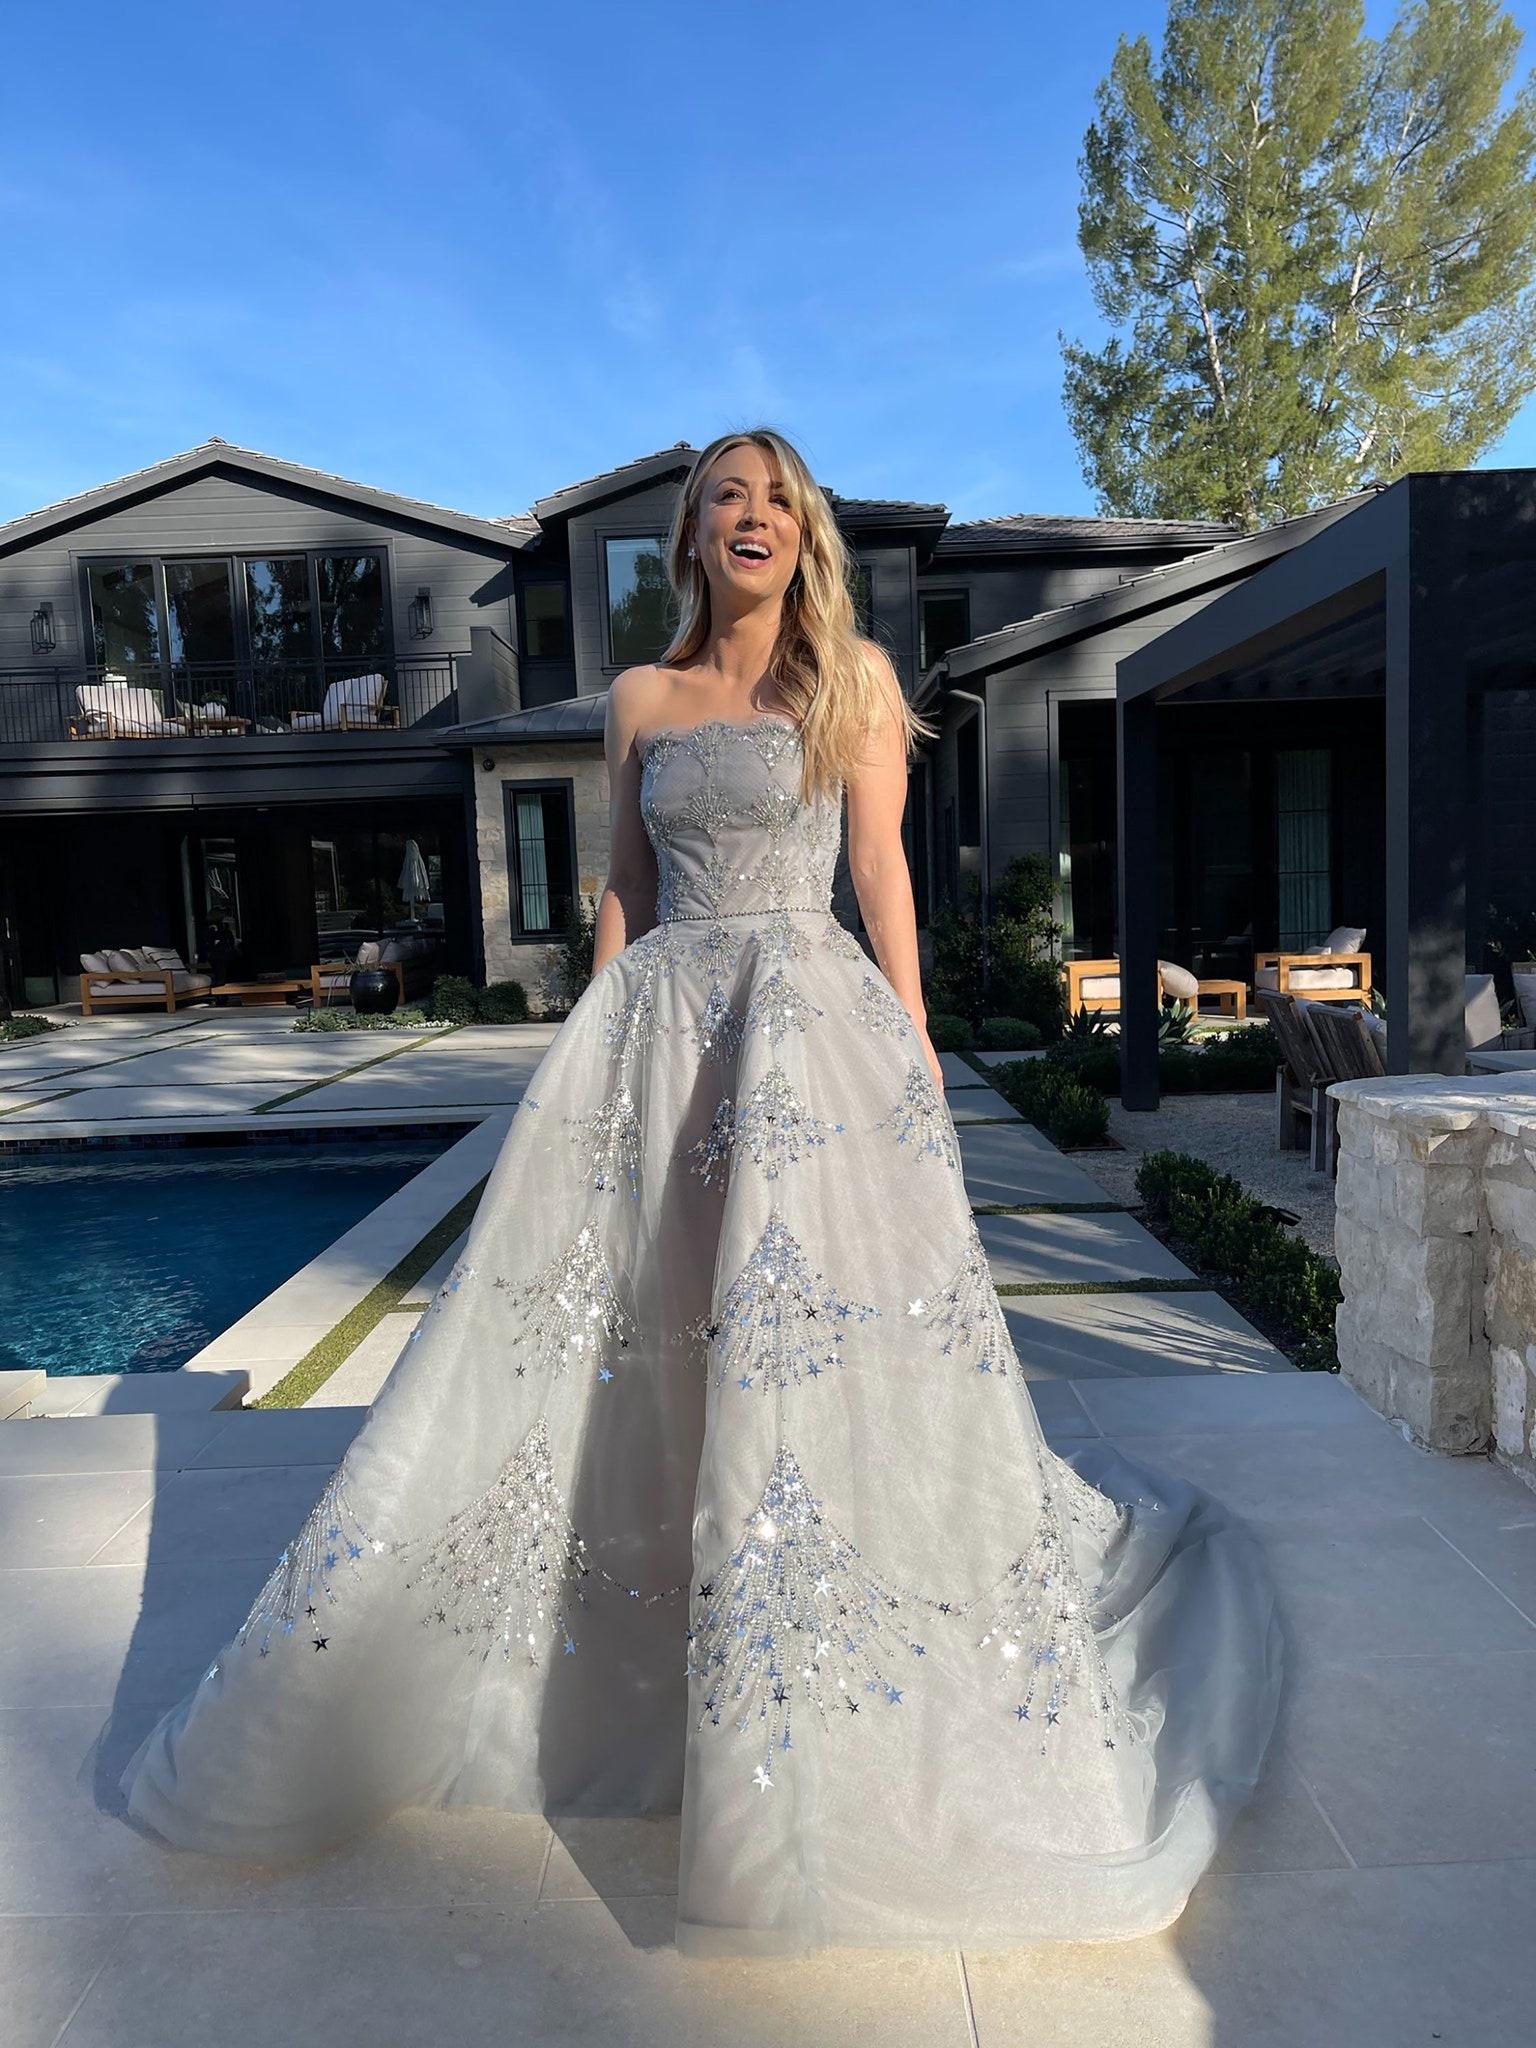 Kaley Cuoco wearing an Oscar de la Renta dress